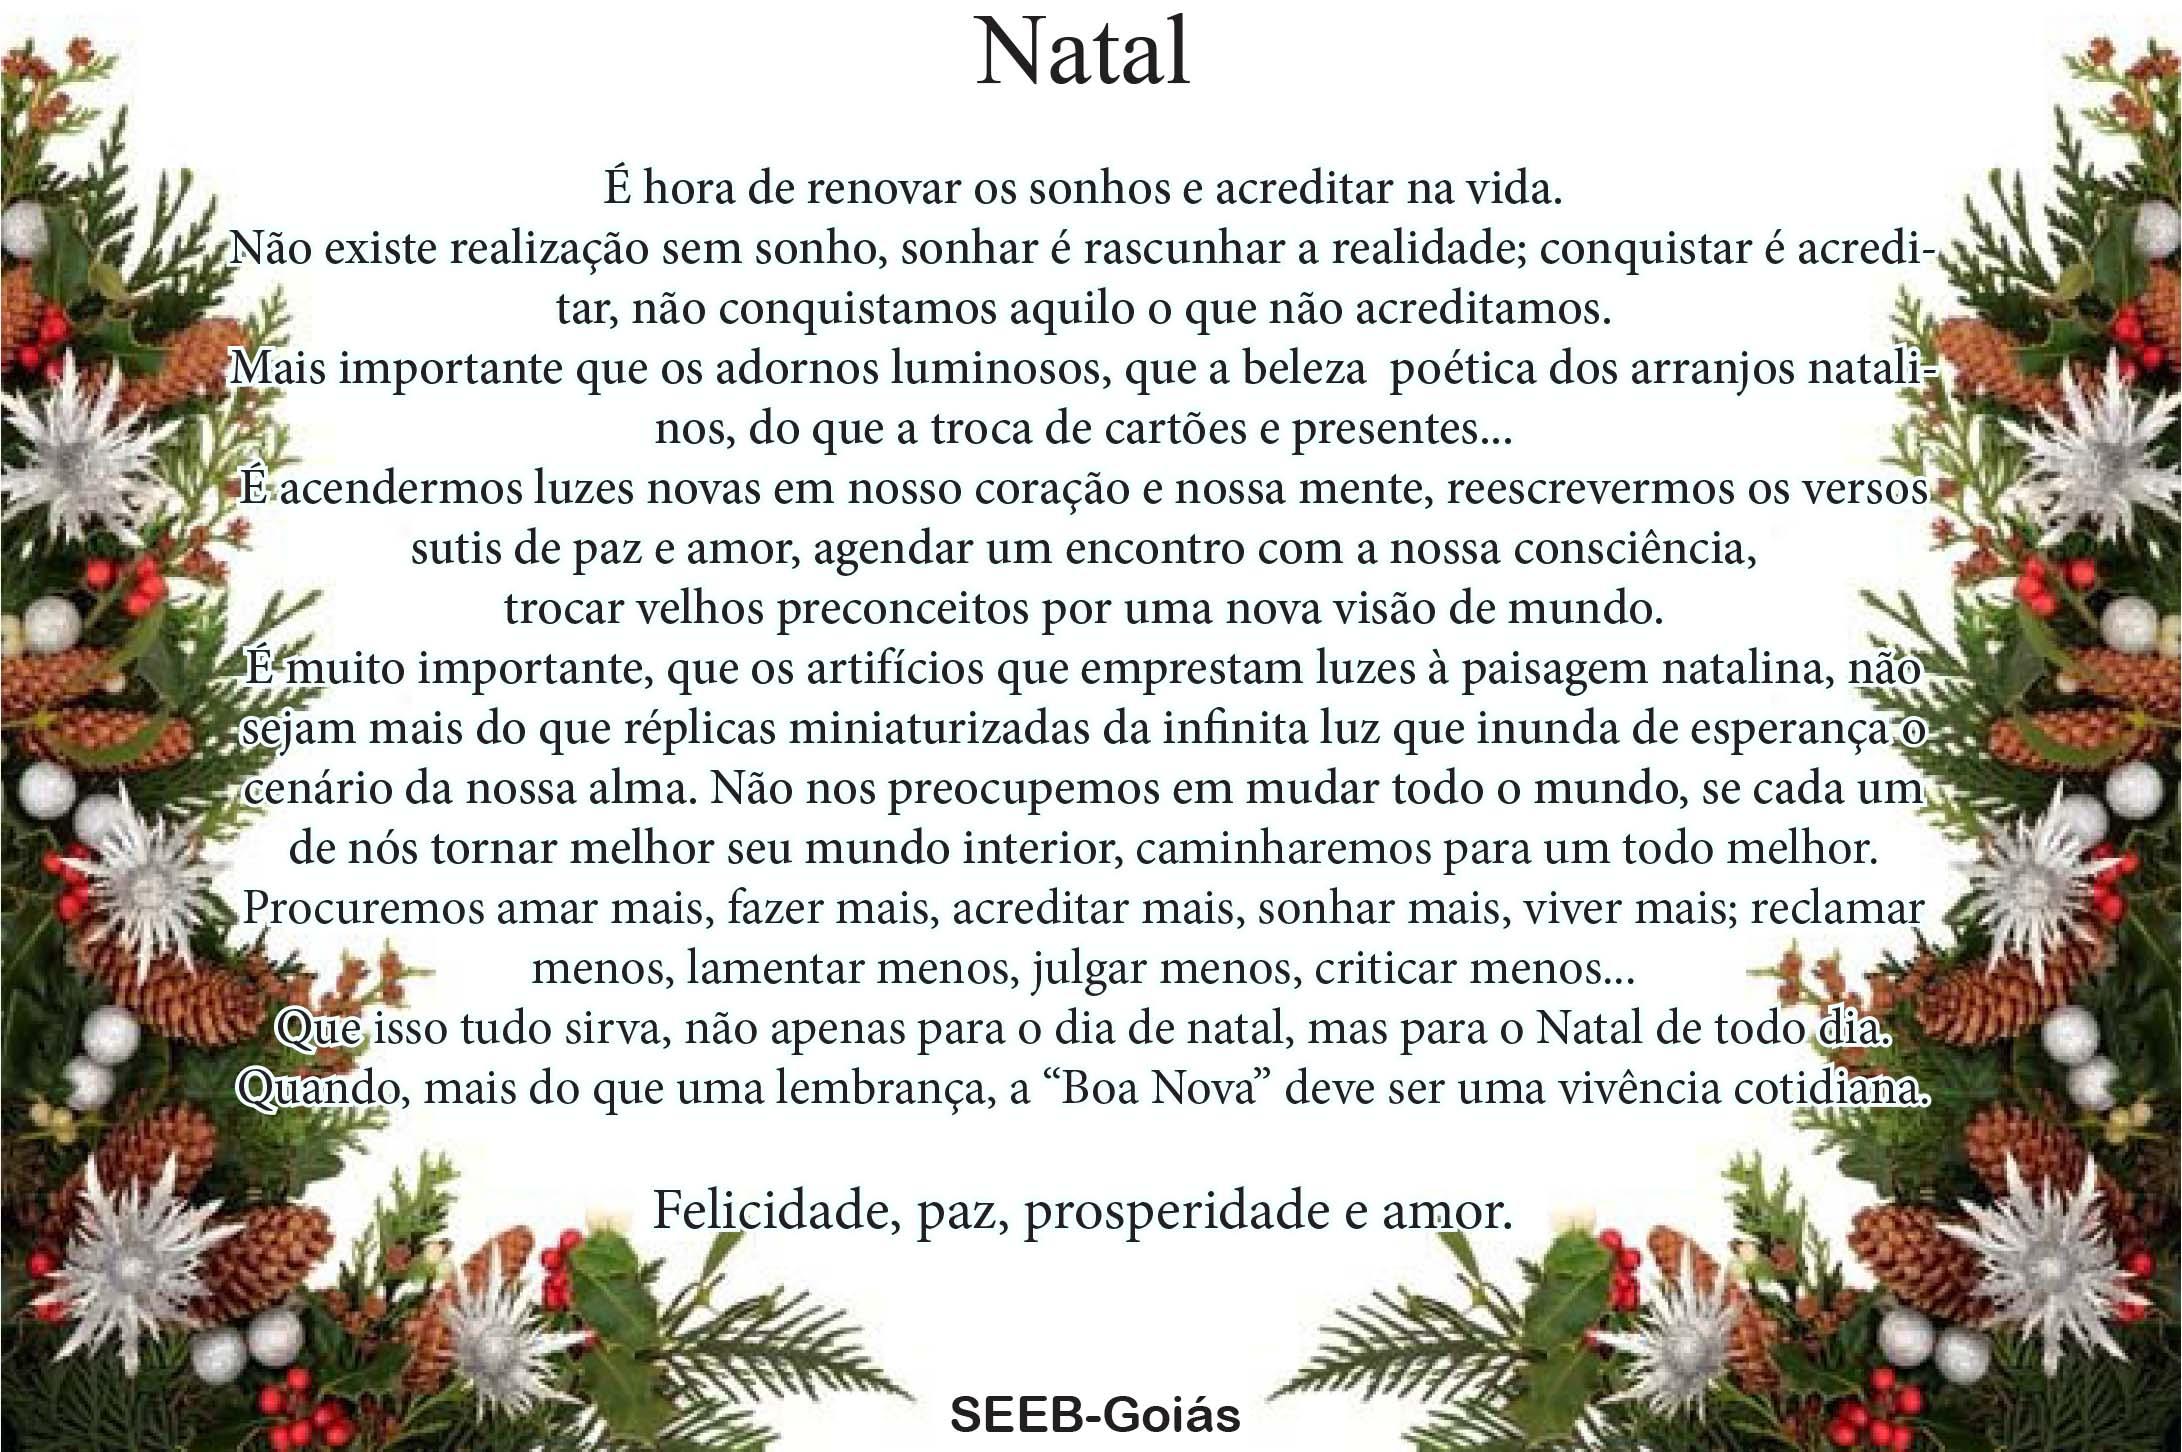 natal-1641761.jpg